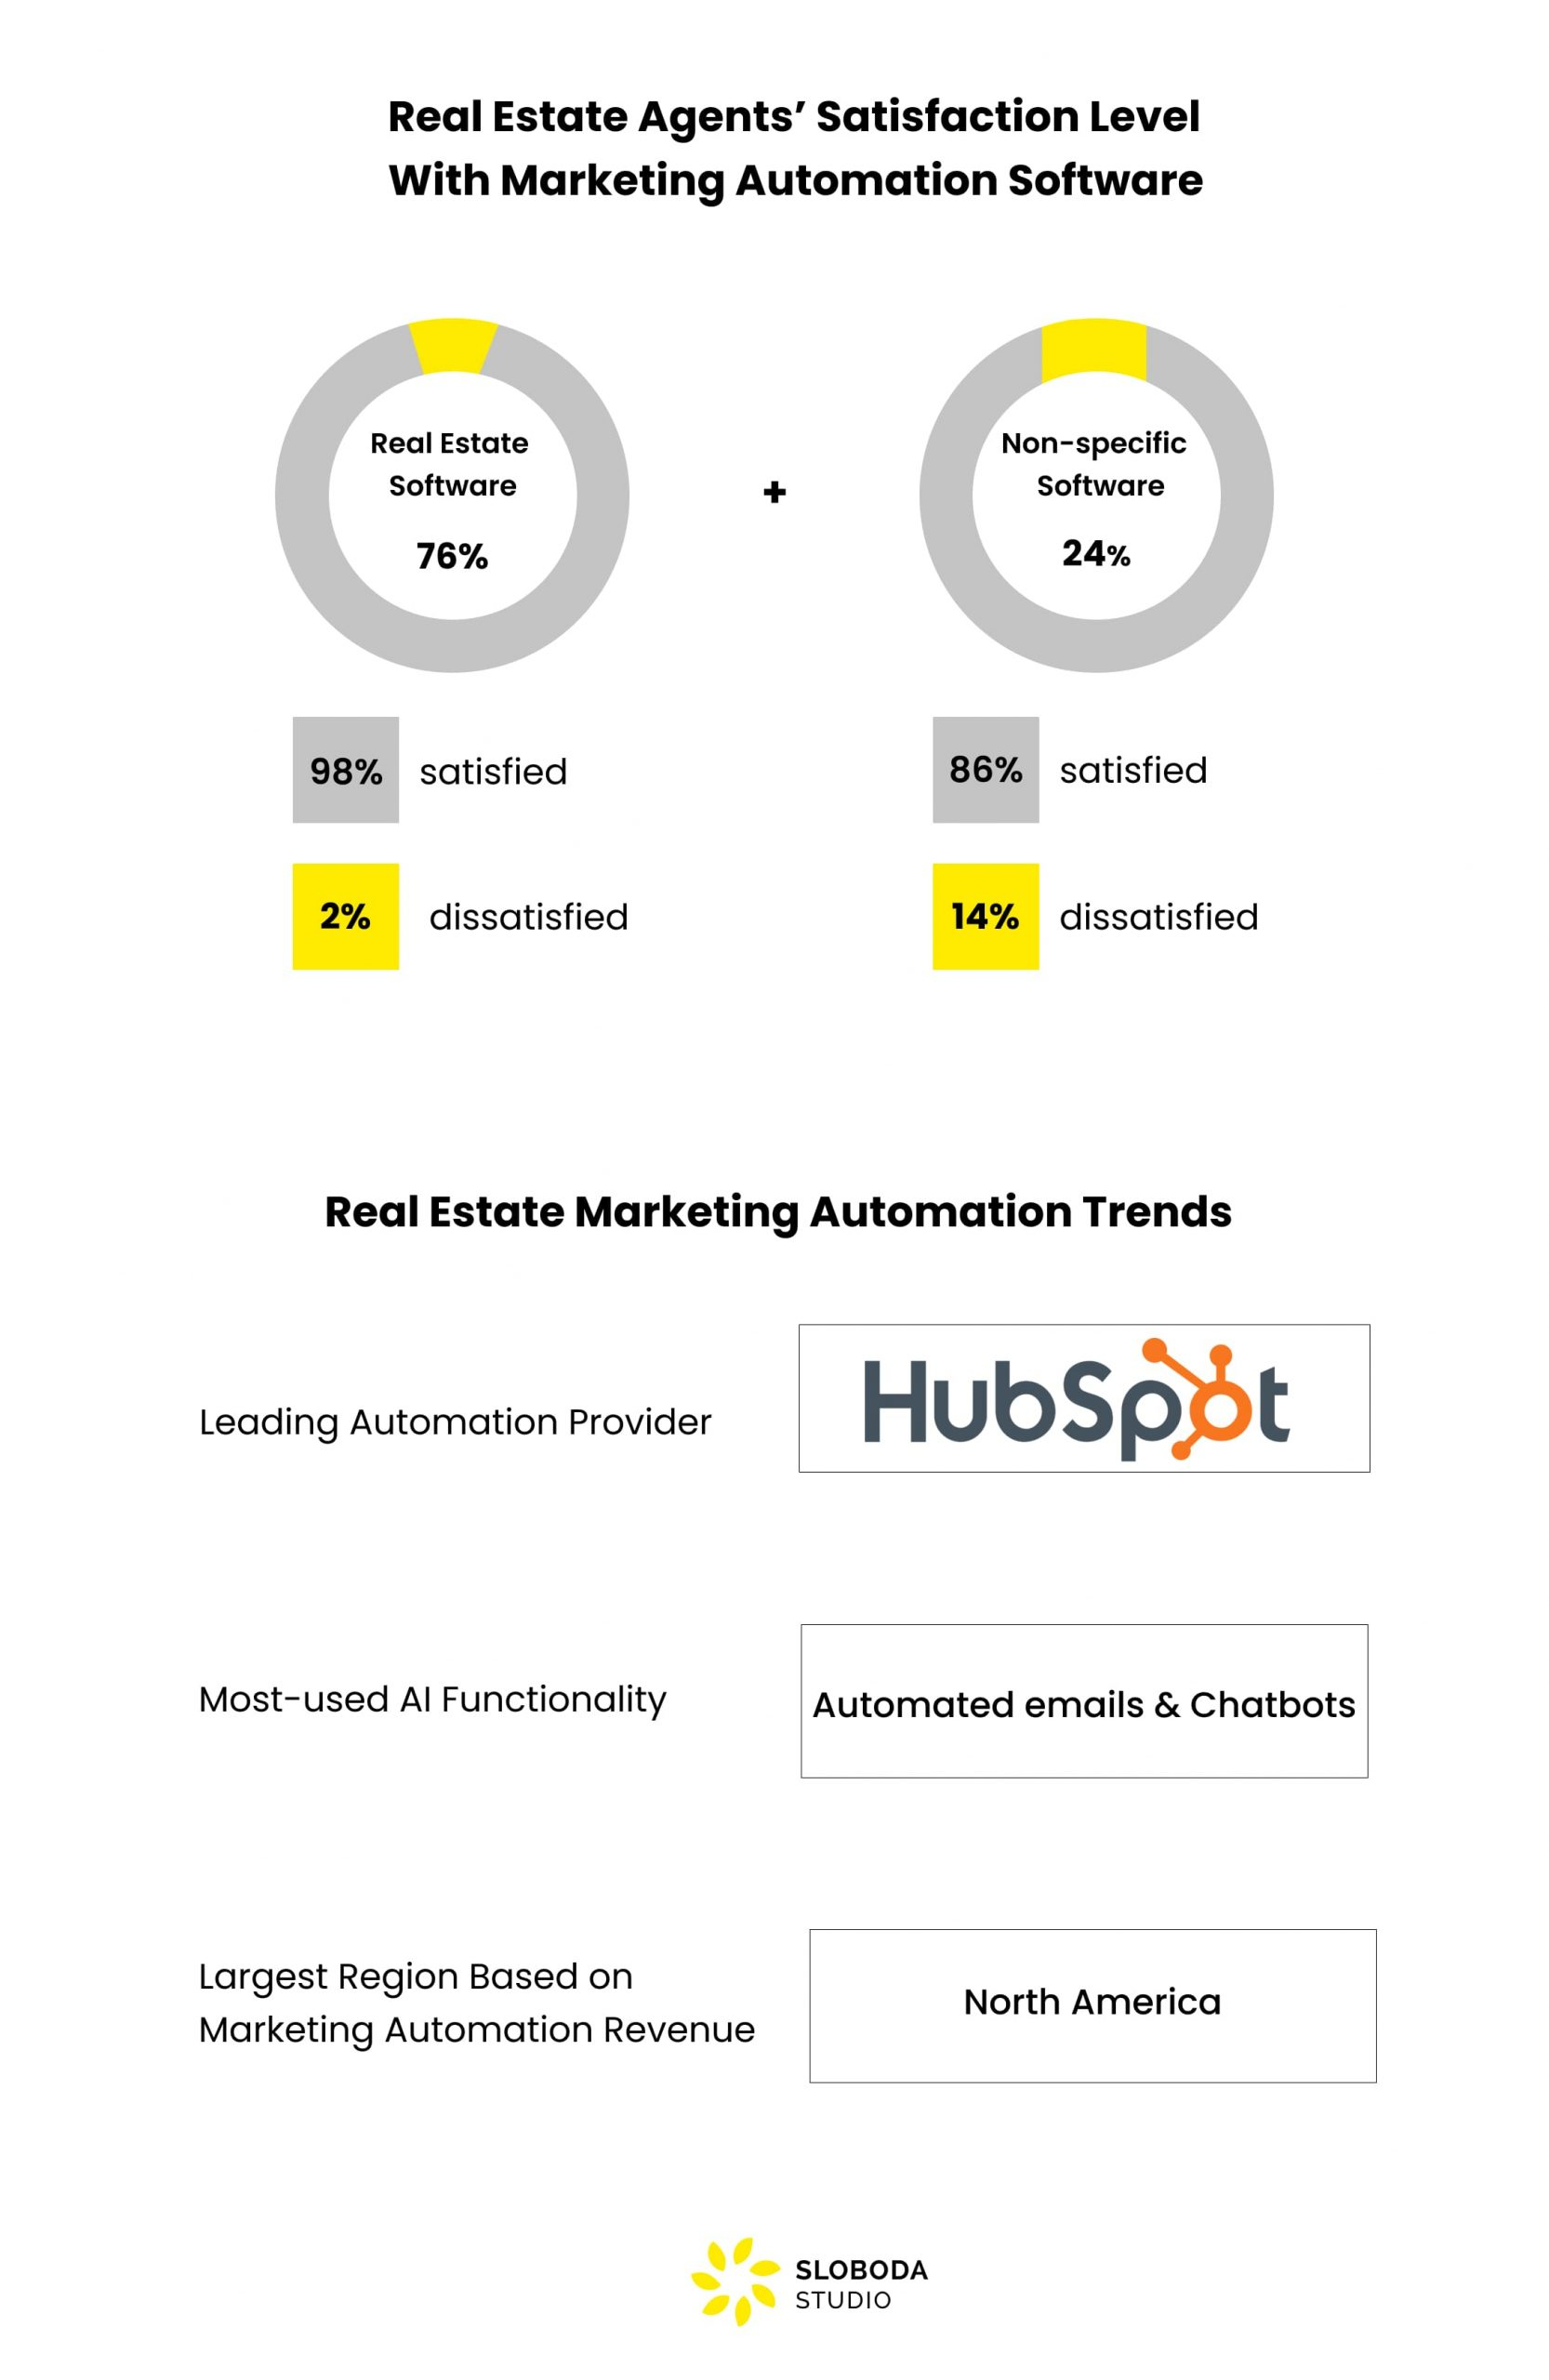 RE marketing automation satisfaction level